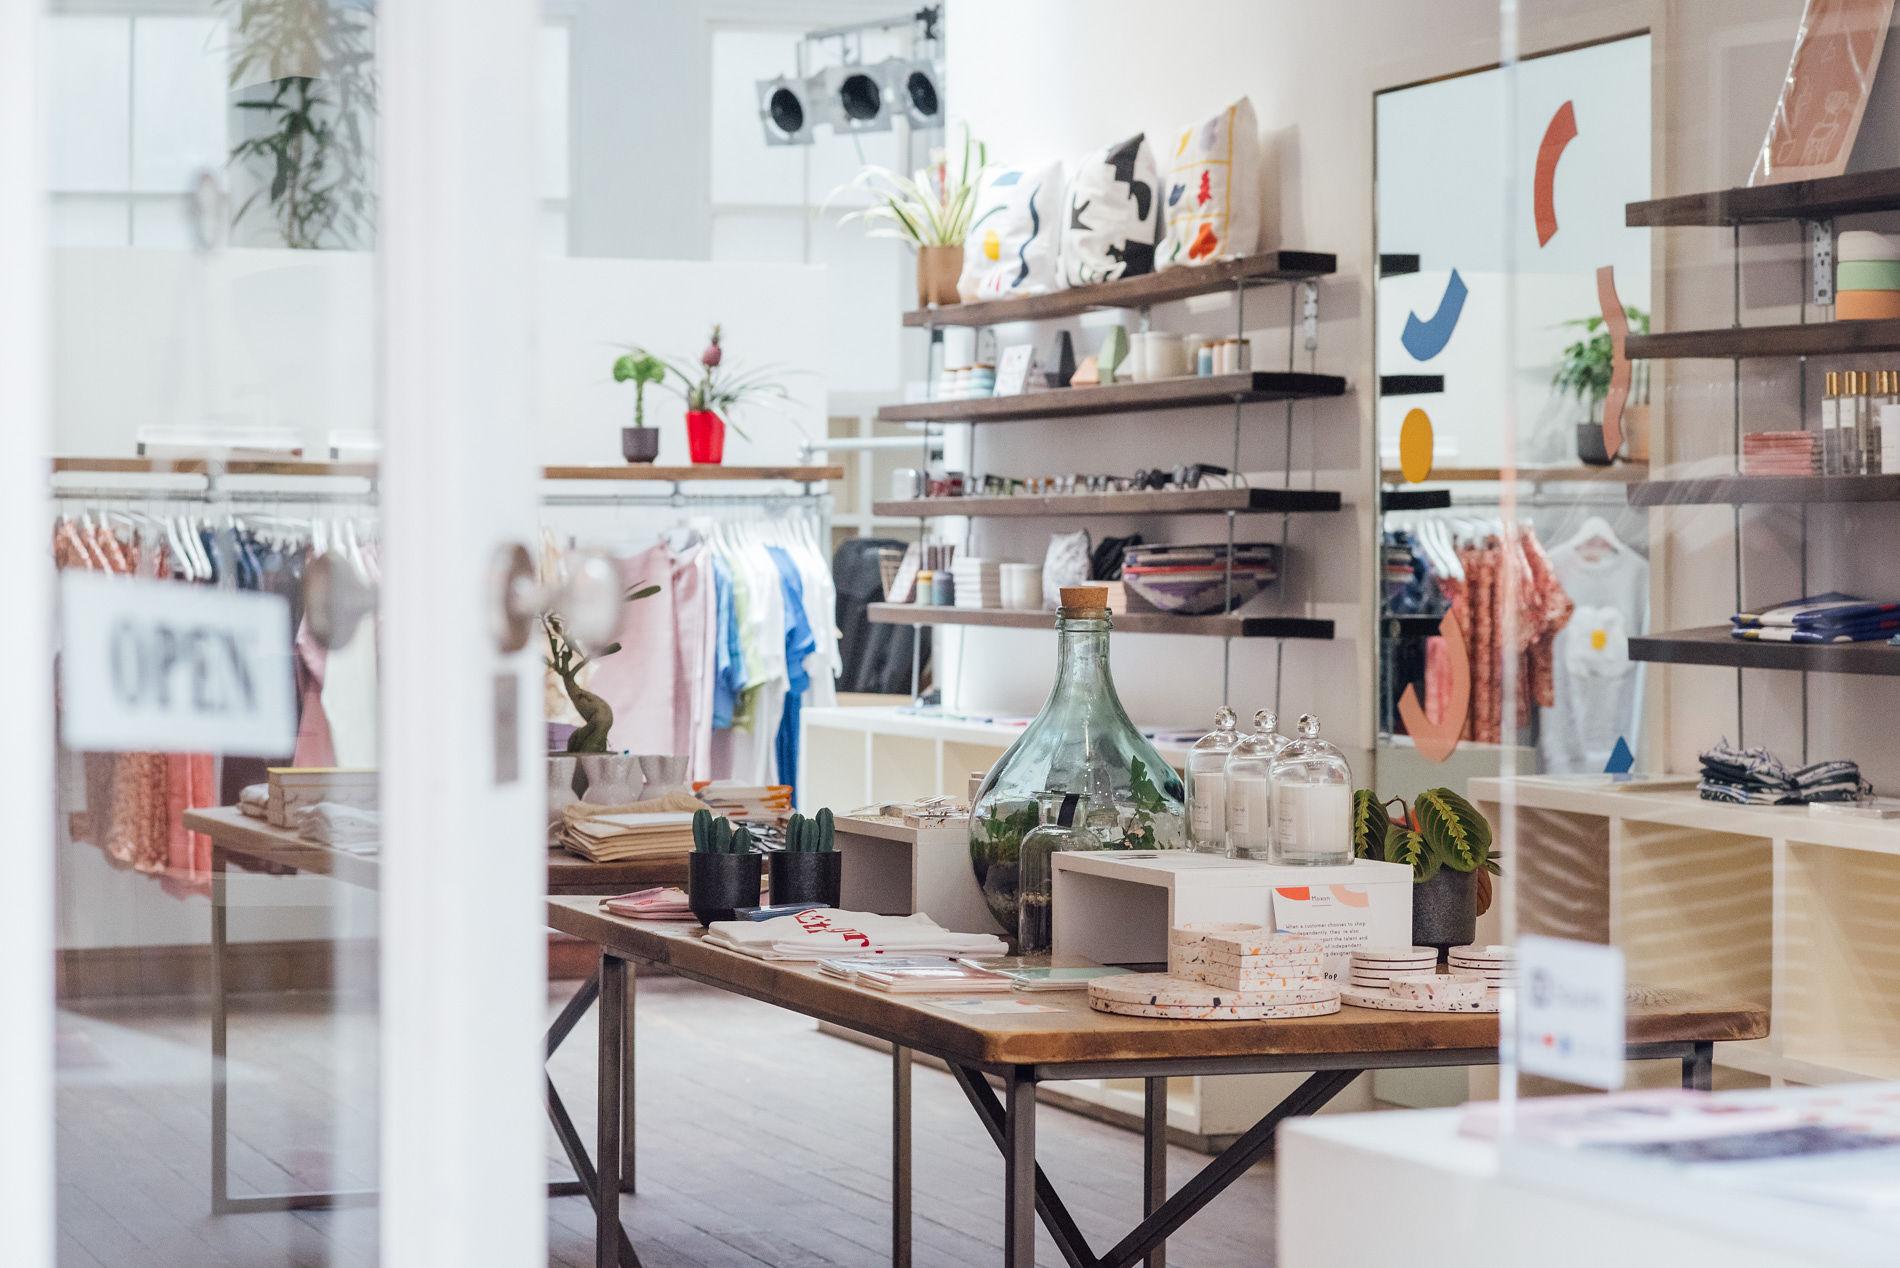 PopIN-Shop-Shoreditch-WeekendIN-May-2019-Web-94.jpg